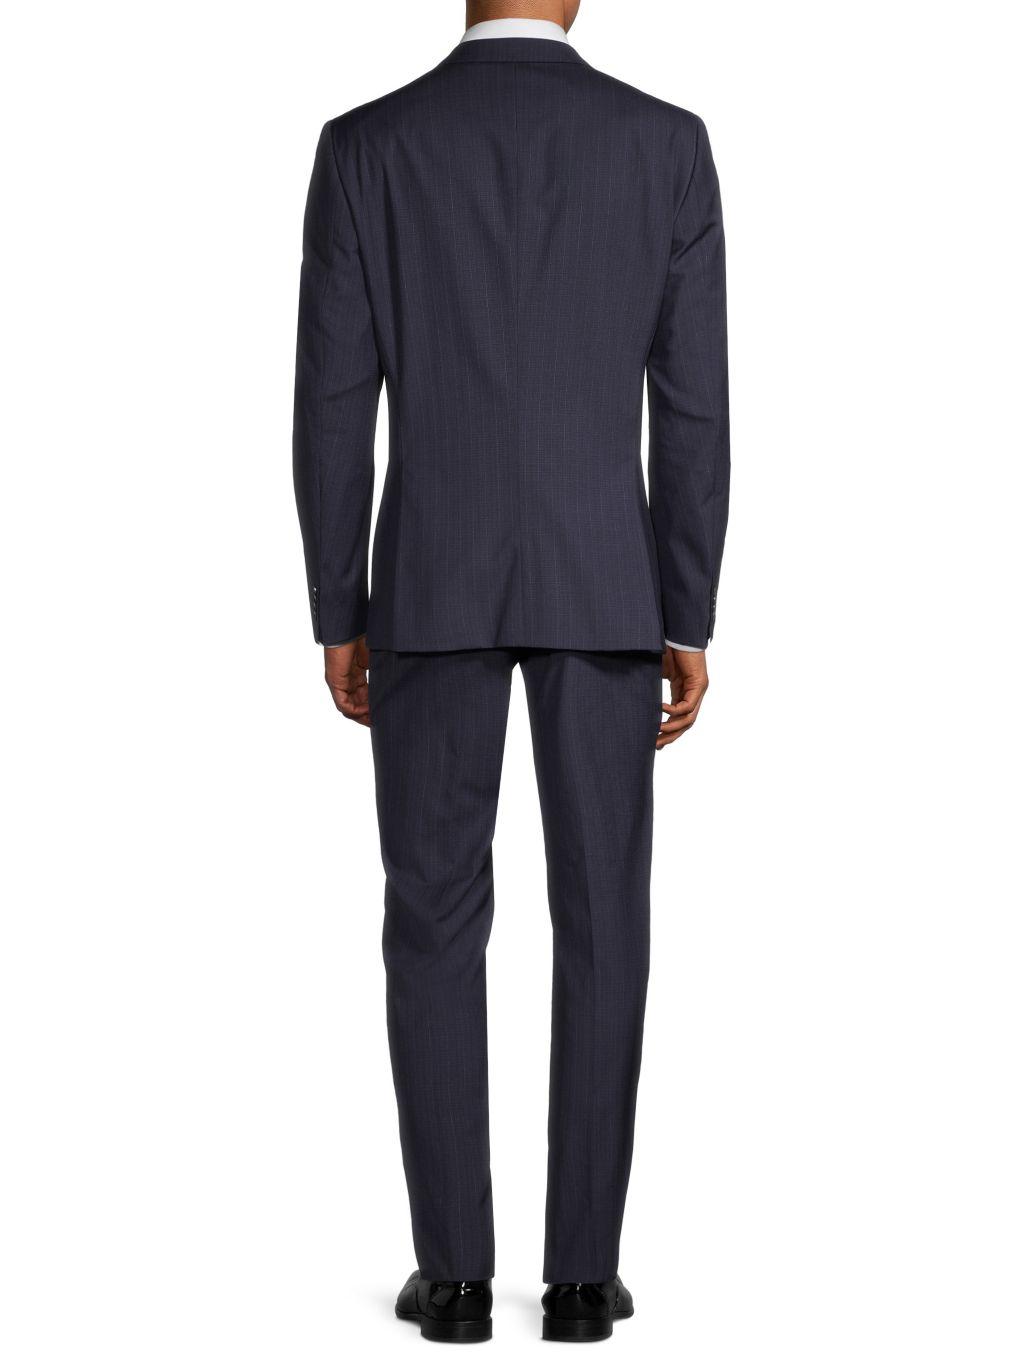 Hugo Boss Super 110 Genius Check Regular-Fit Virgin-Wool Suit